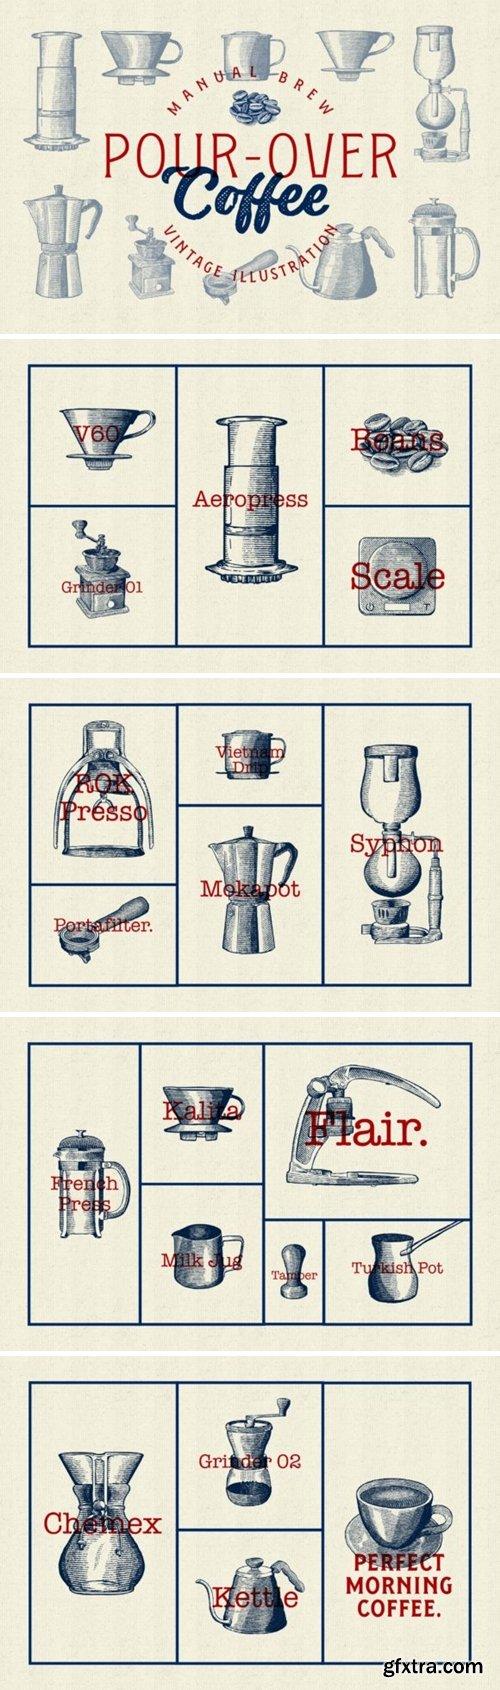 Pour over Coffee Illustration Vintage 1667253